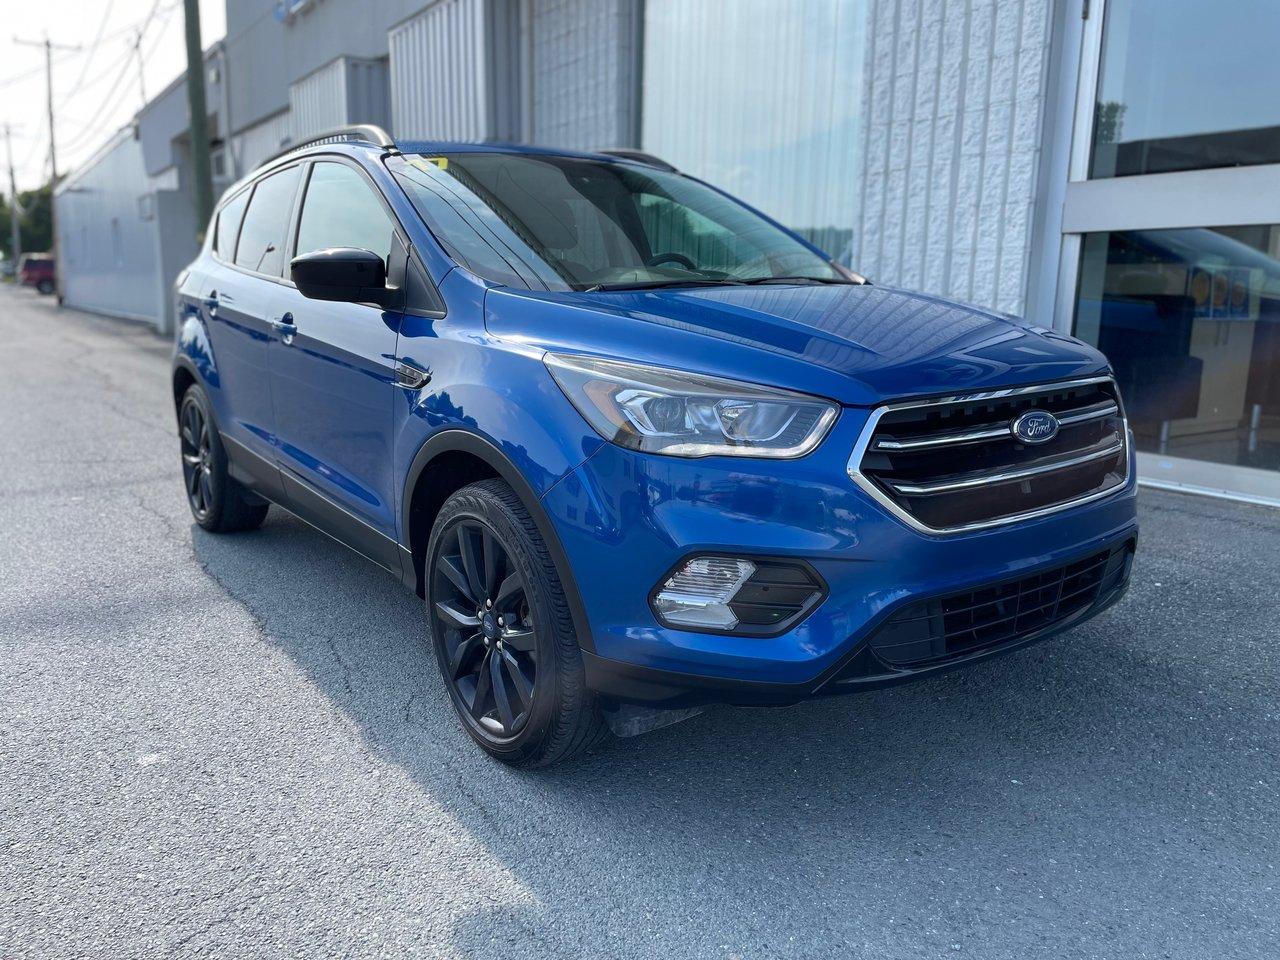 Ford Escape 2017 SE AWD ECOBOOST